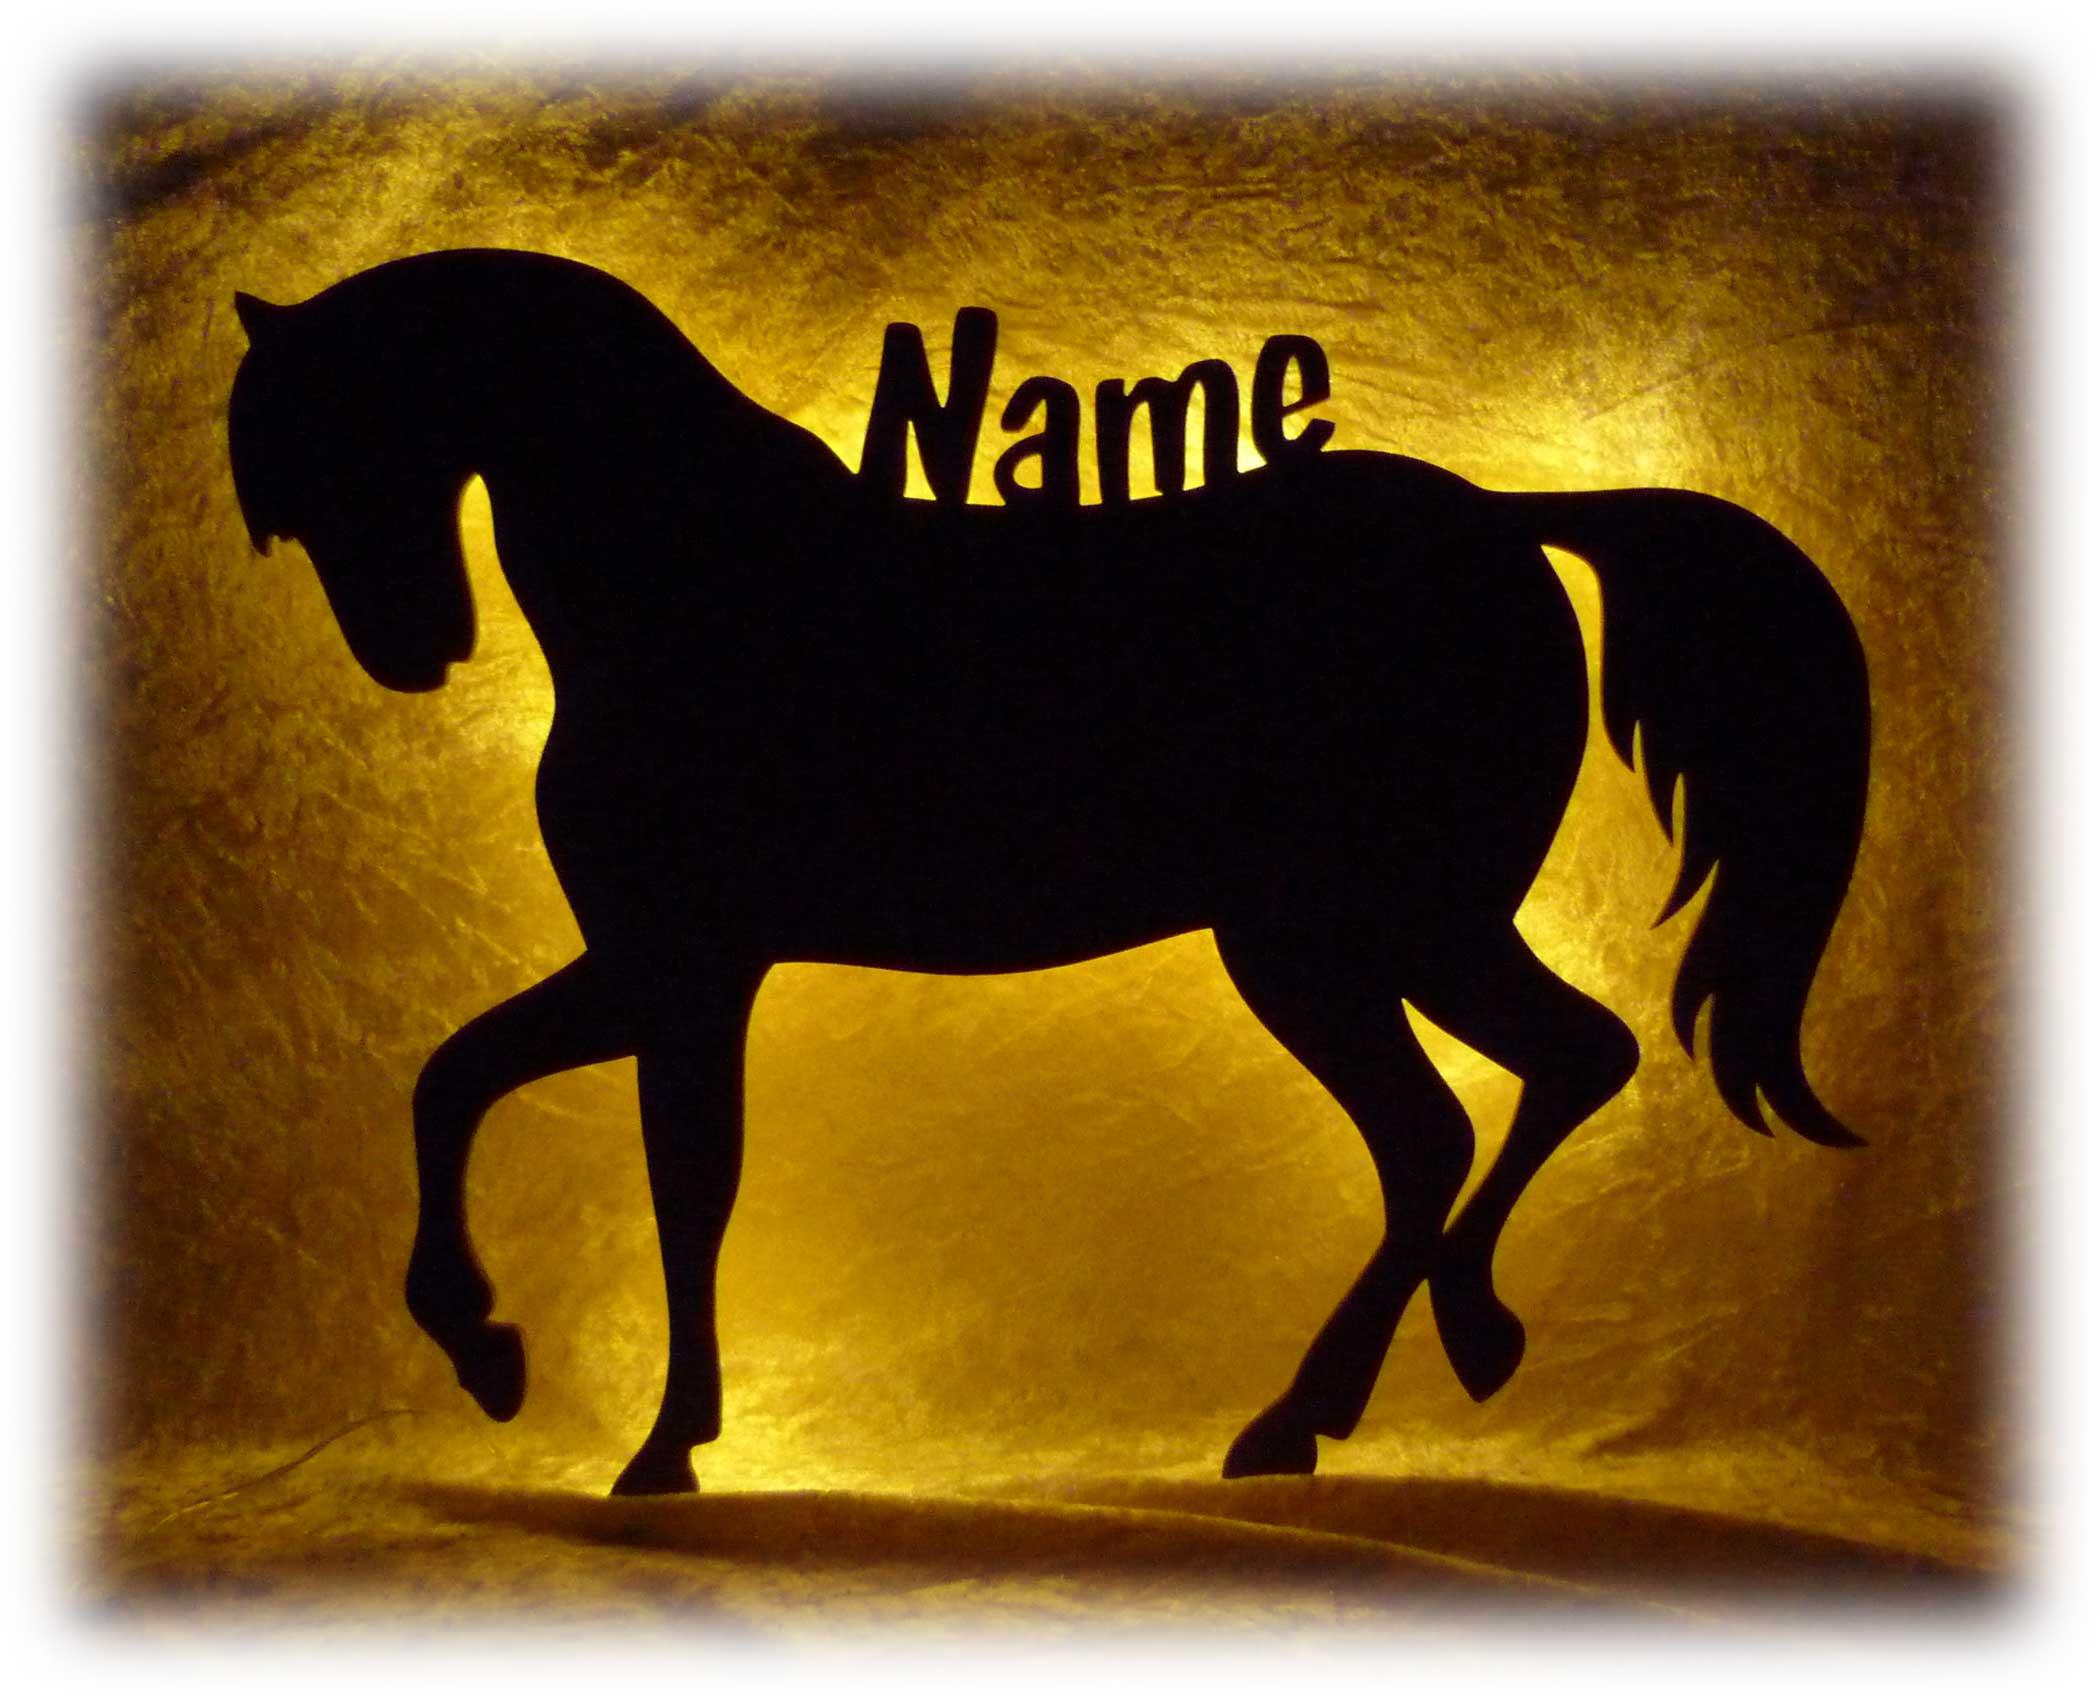 led pferd nachtlicht lampe mit namen individuell. Black Bedroom Furniture Sets. Home Design Ideas